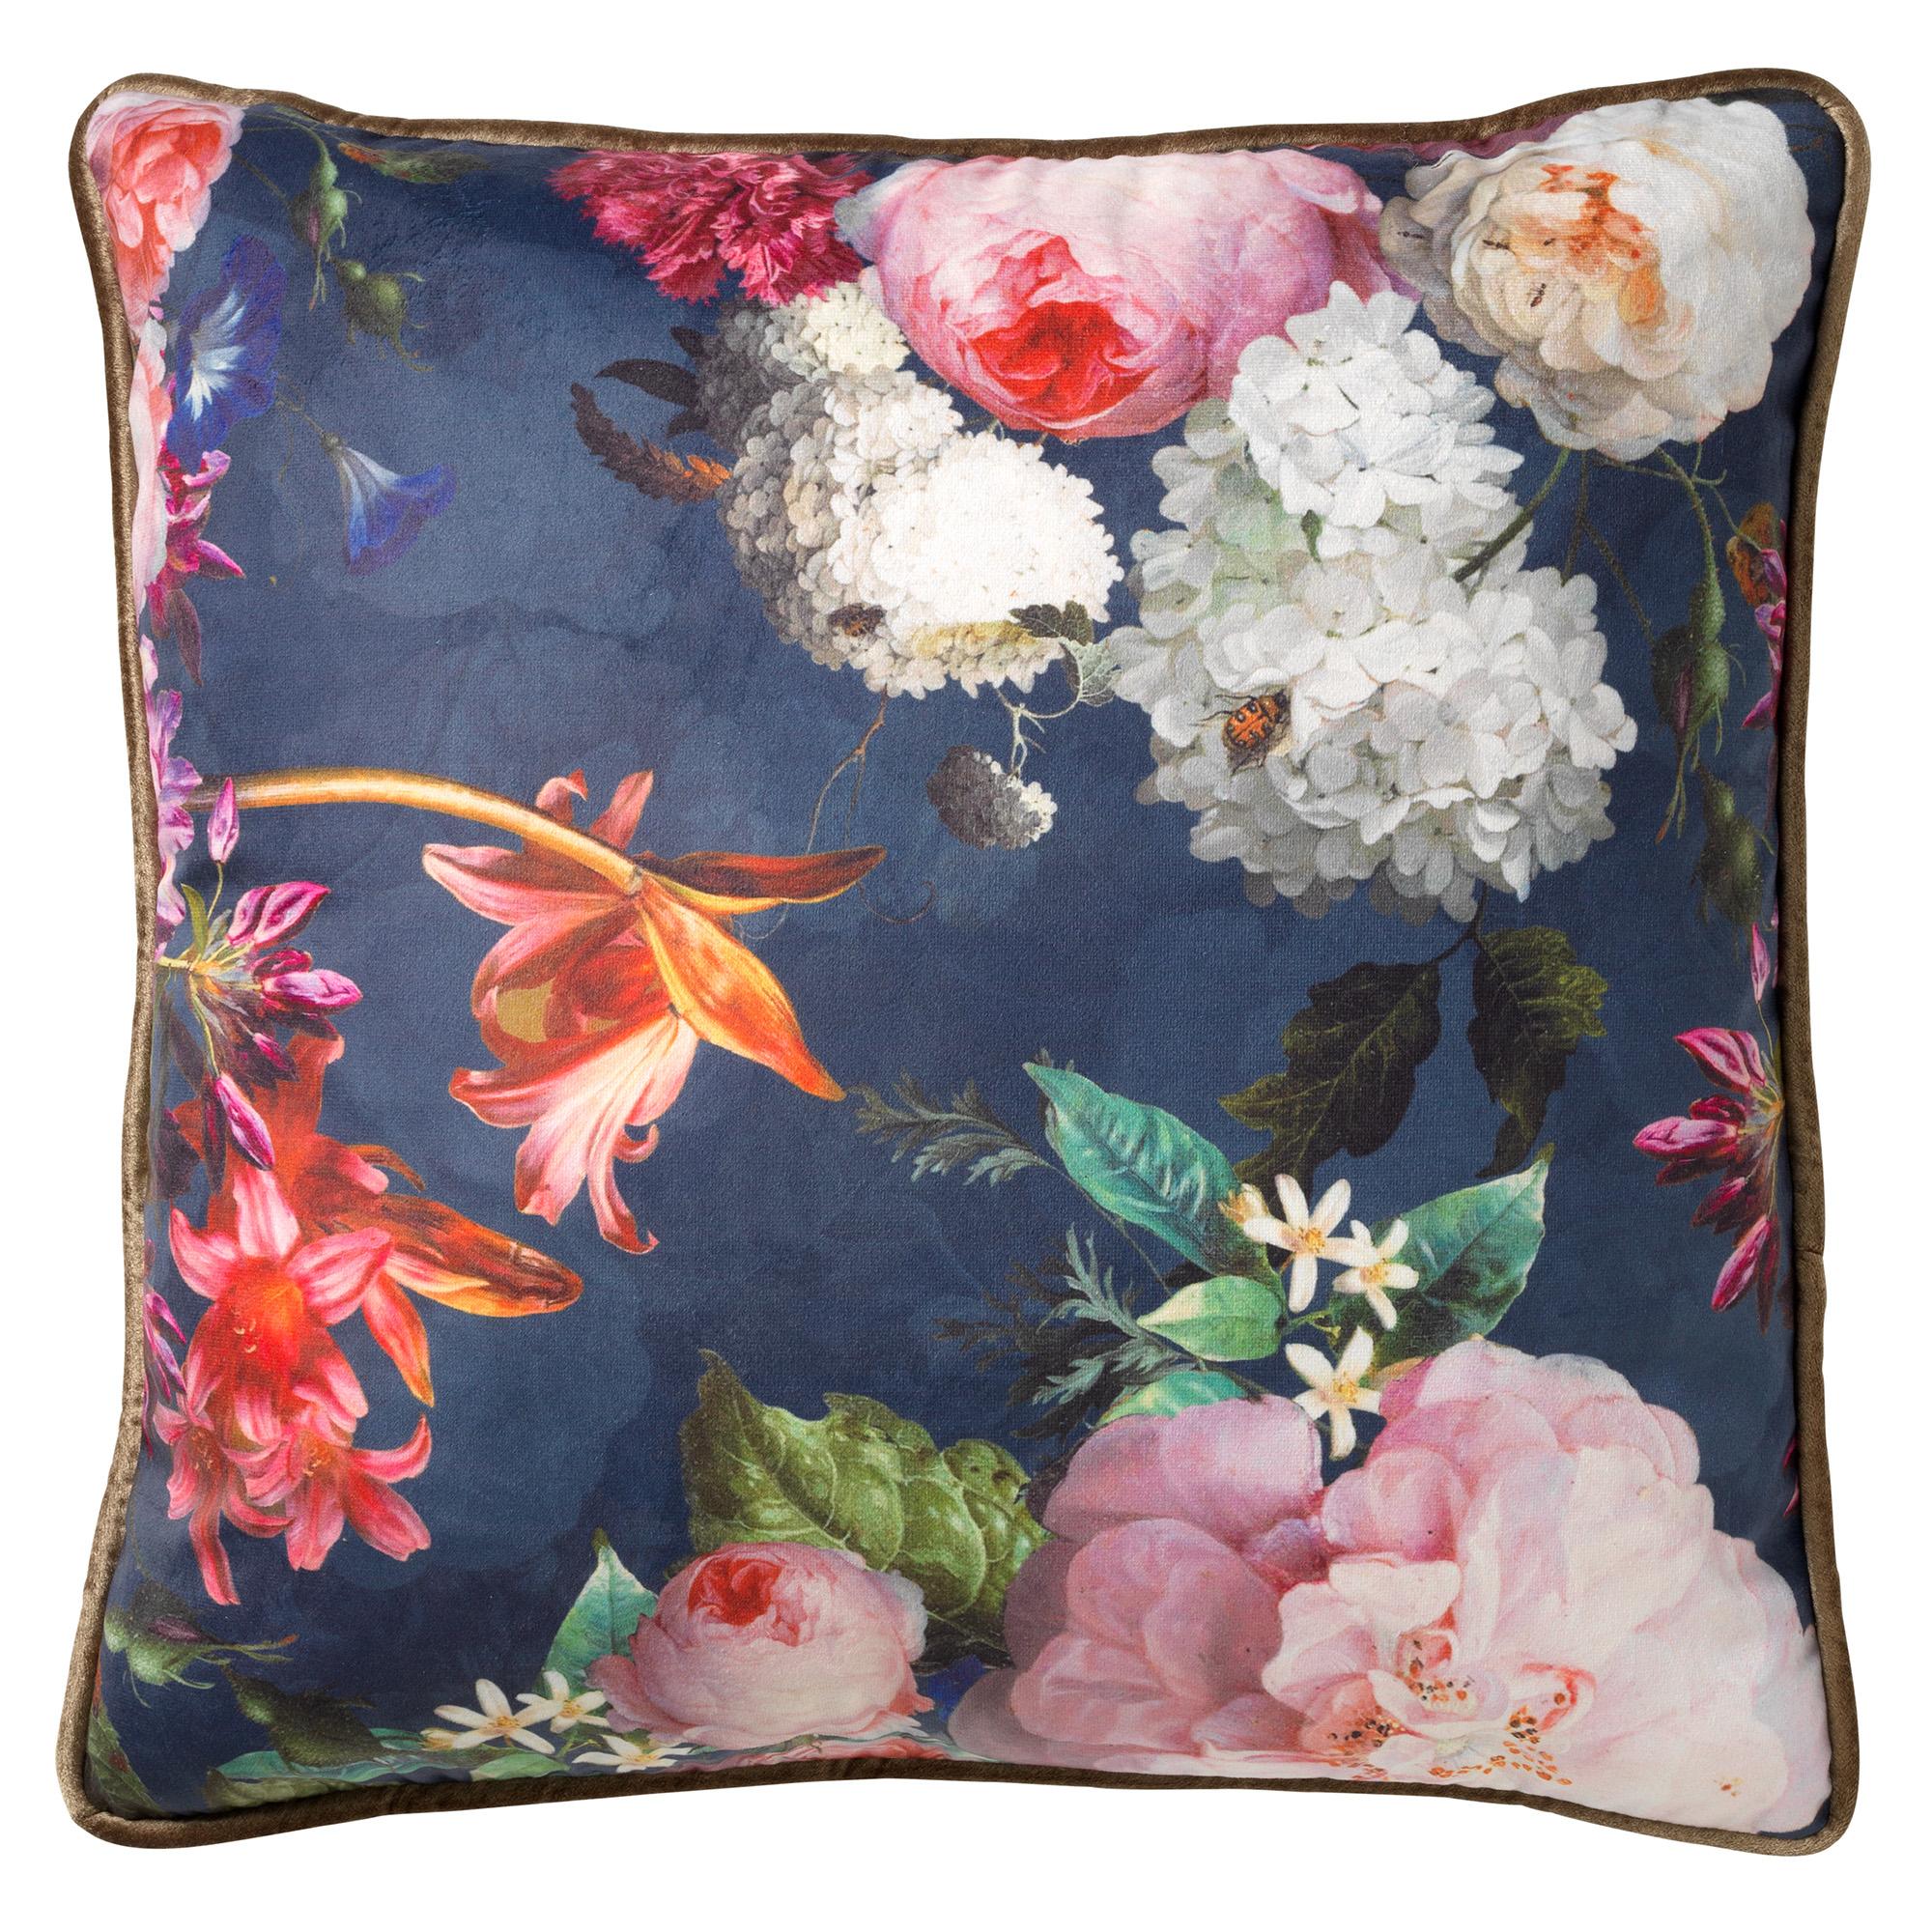 FENNA - Sierkussen met bloemenpatroon Insignia Blue 45x45 cm